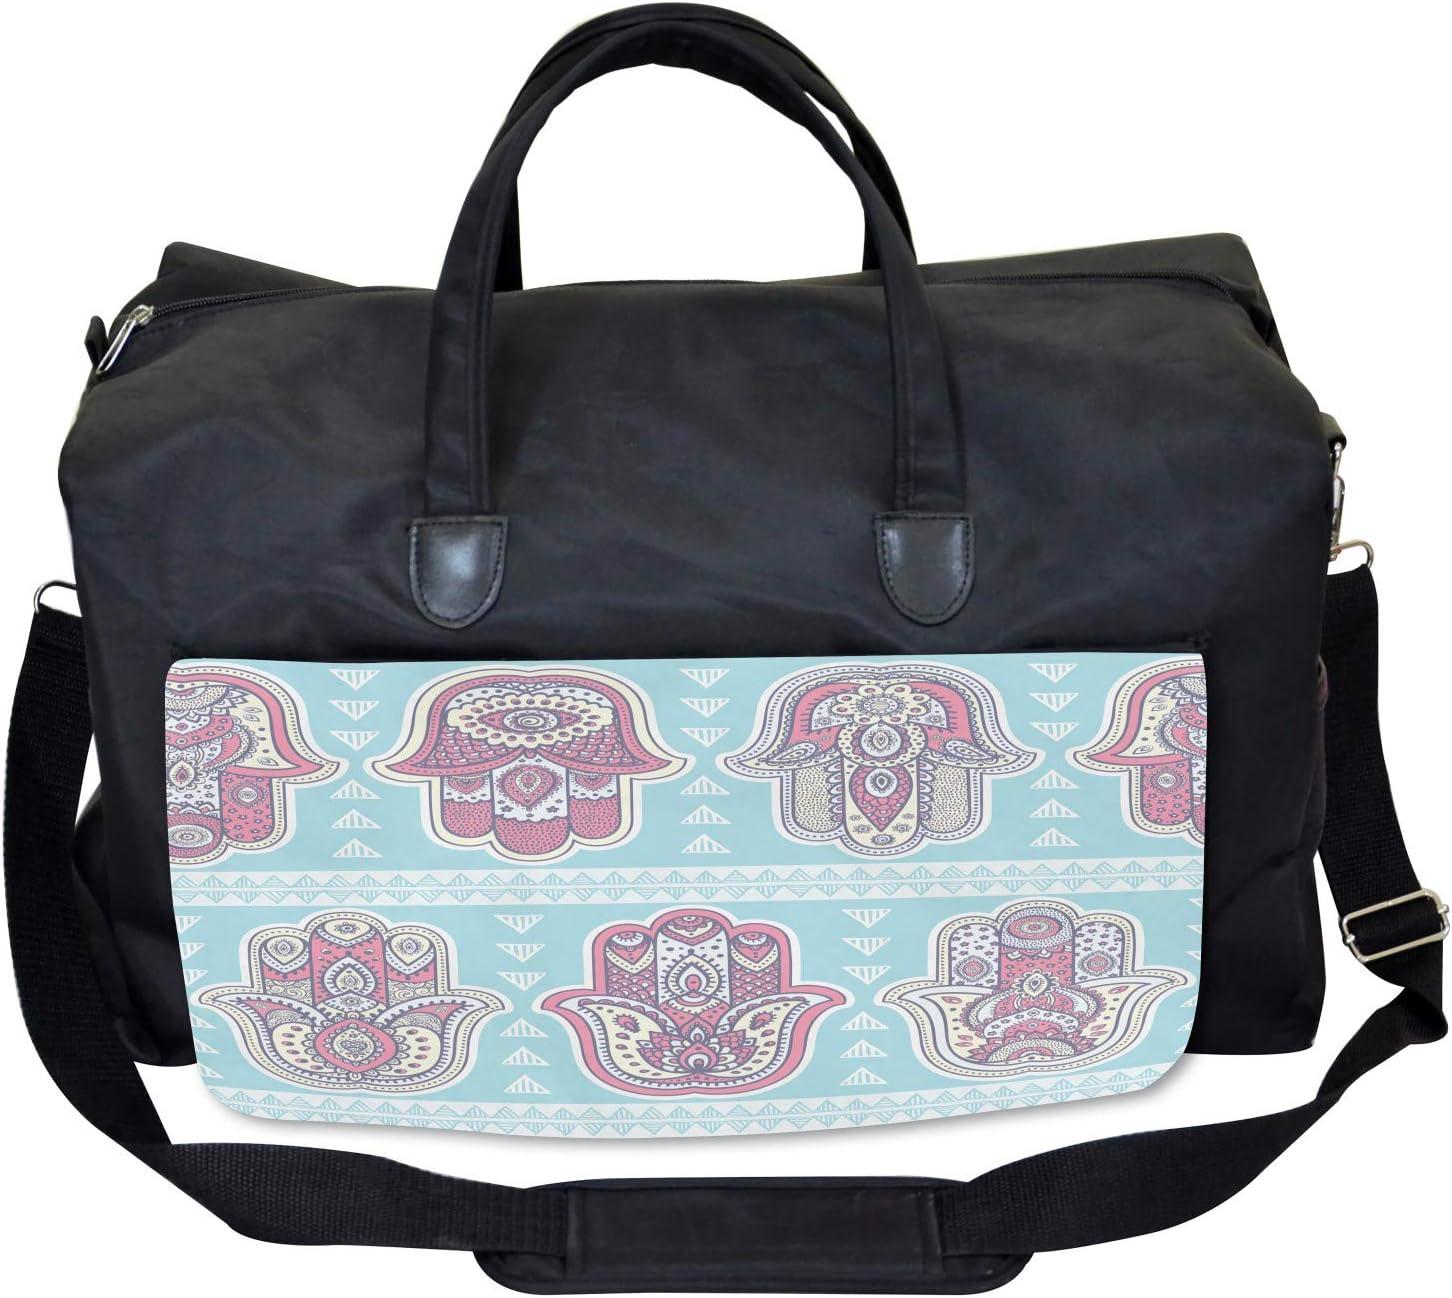 Boho Ornate Asian Art Large Weekender Carry-on Ambesonne Hamsa Gym Bag